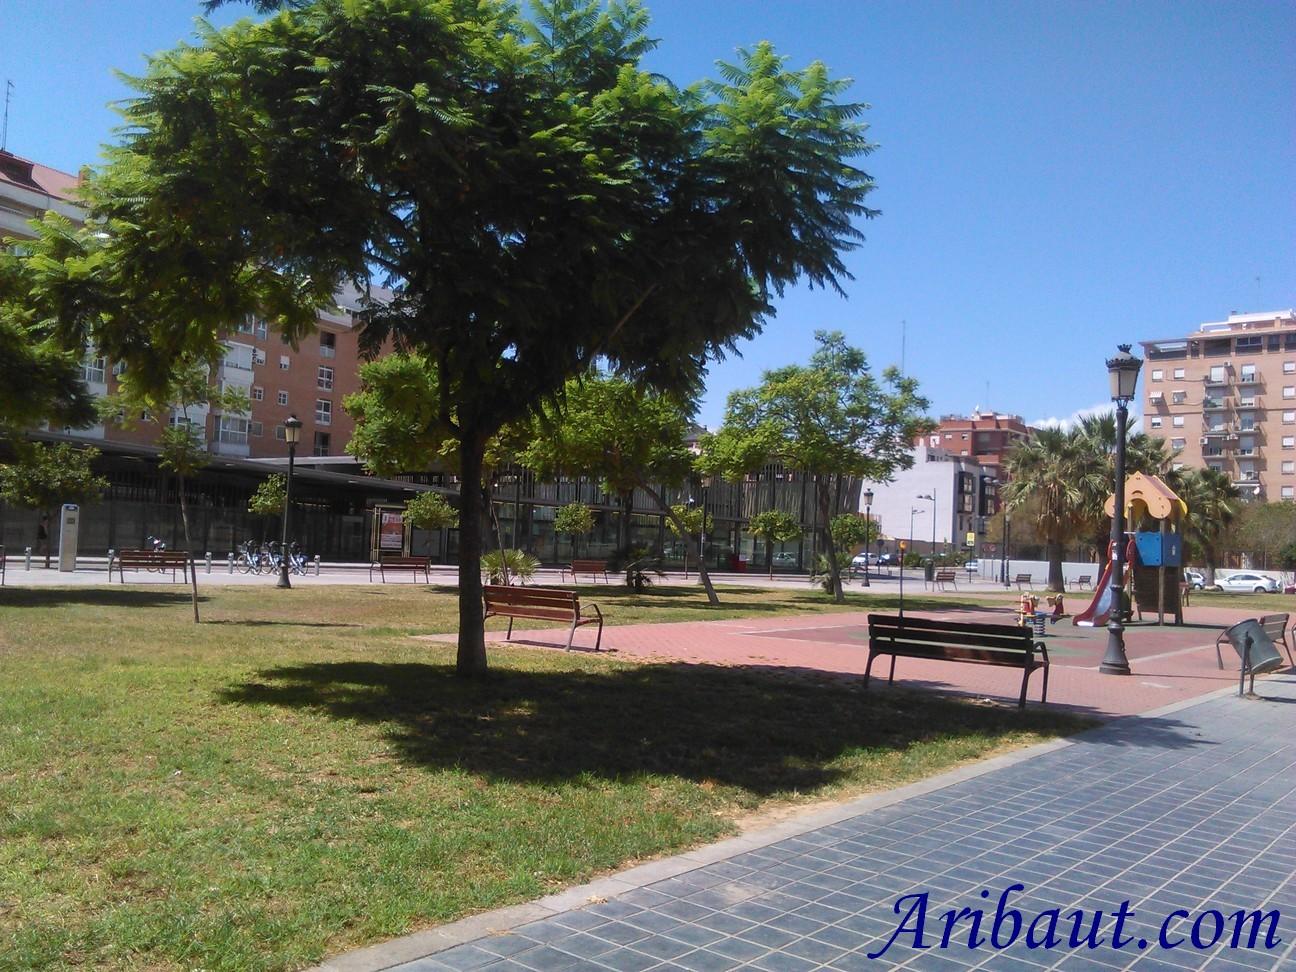 https://aribaut.com/images/appartement-valence-espagne-cadre-de-vie-valencia-metro-maritim-serreria-petit-parc-infantil-valenbisi.jpg